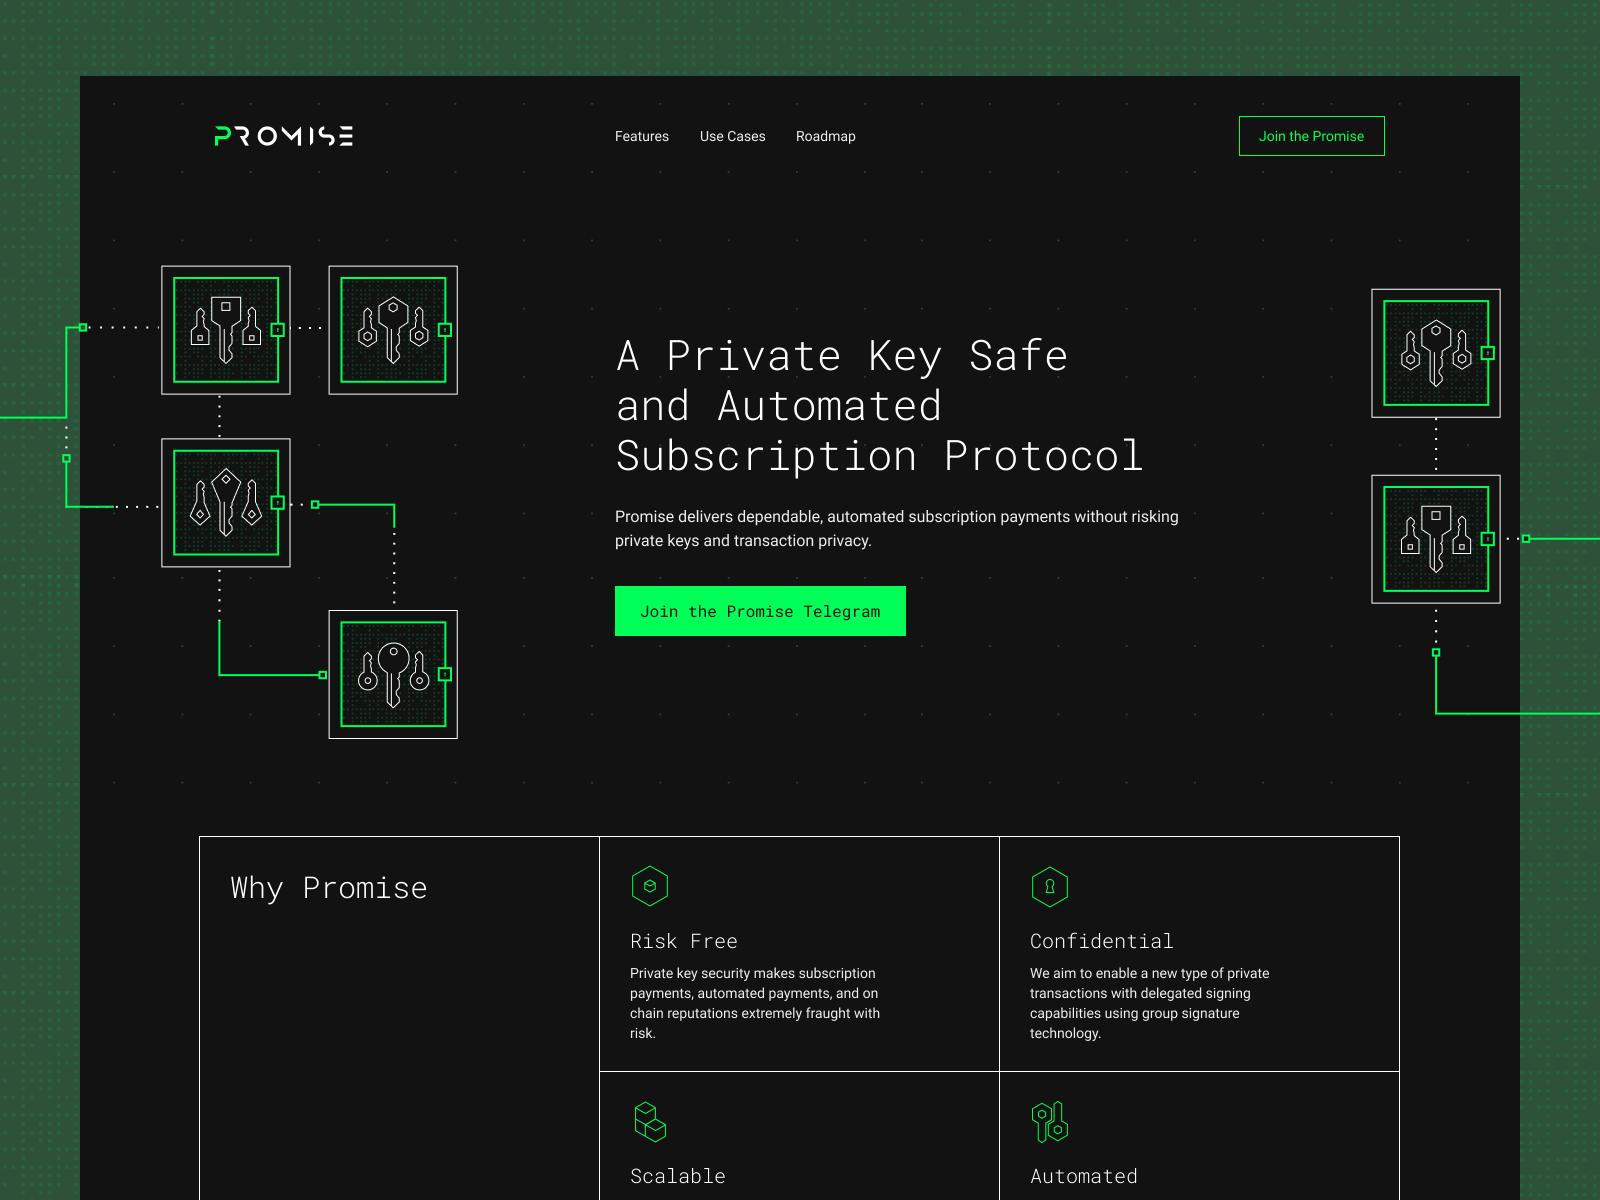 Technology Website Design Example #2